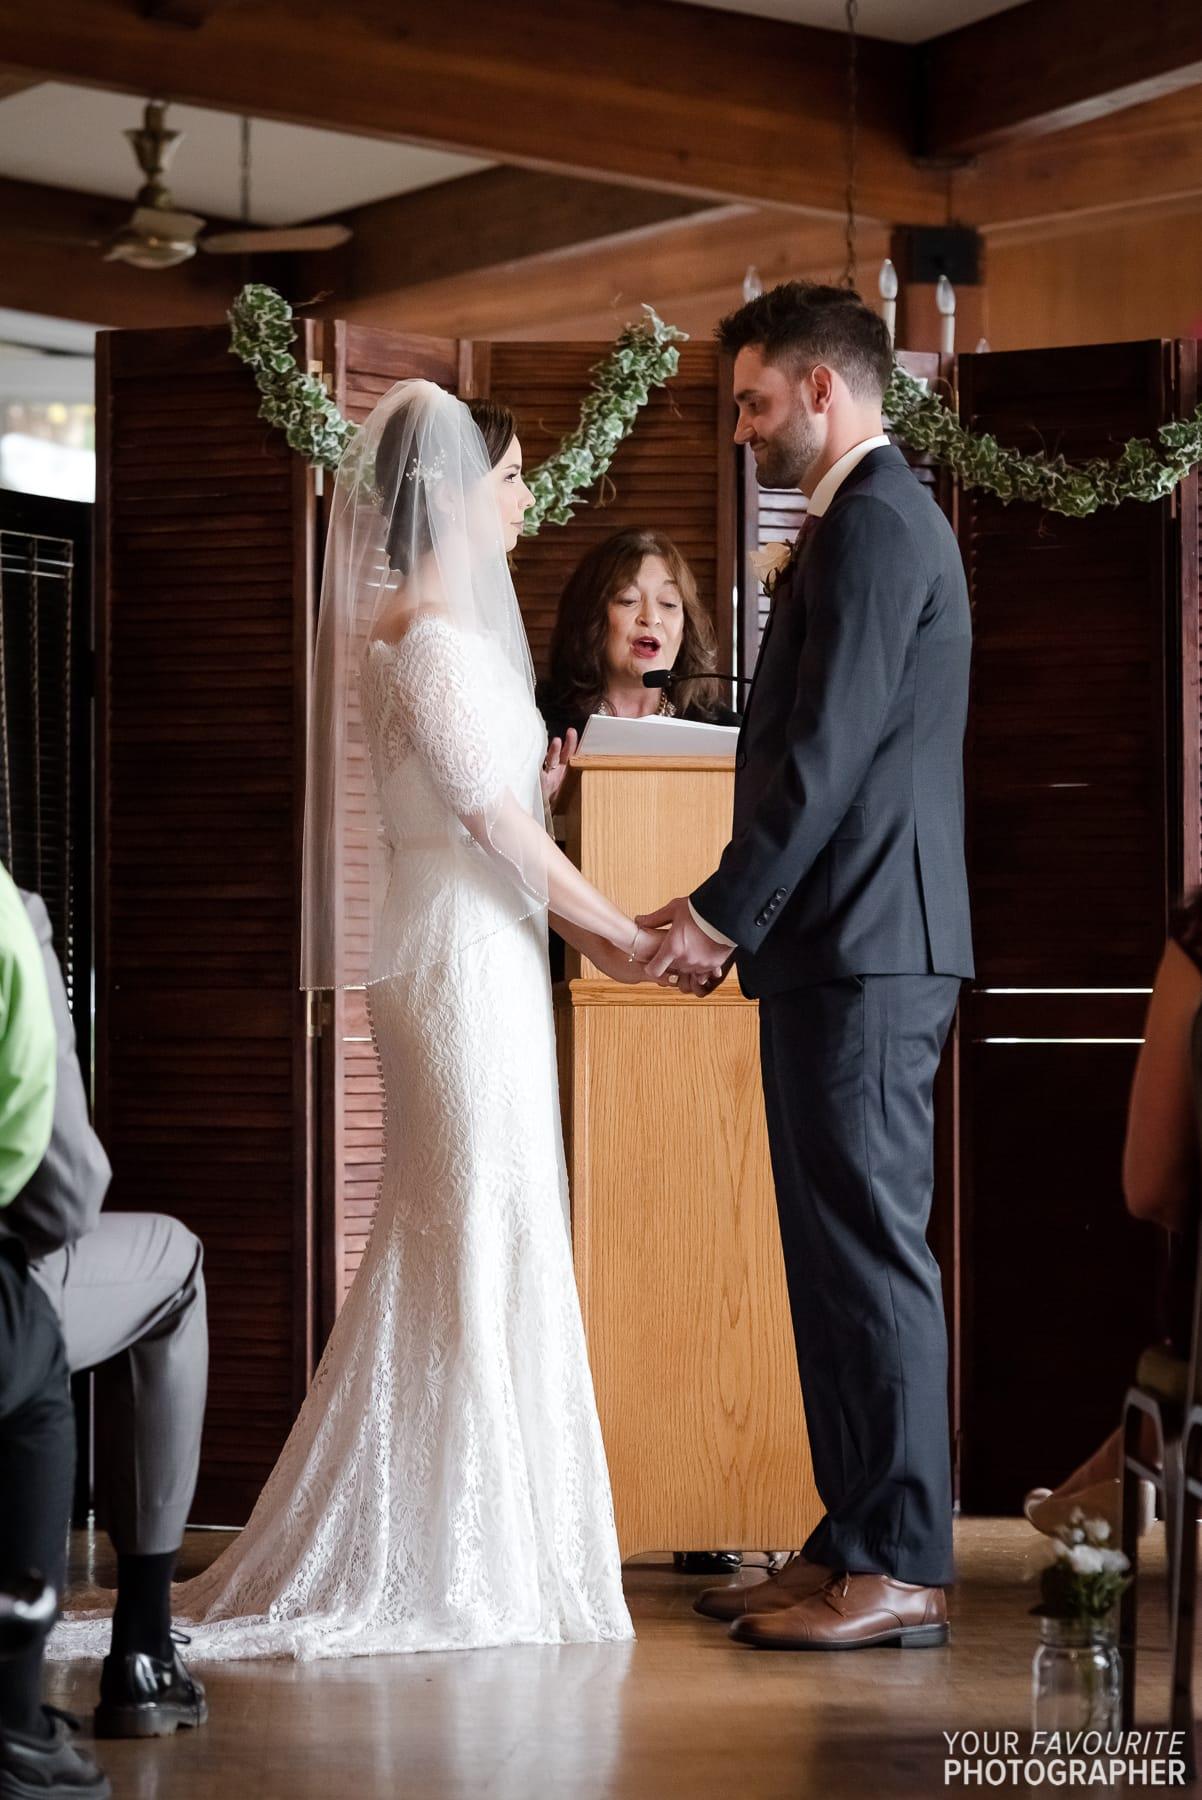 Marly & Mike's Saraguay House Wedding and Dingle Park Wedding Photos